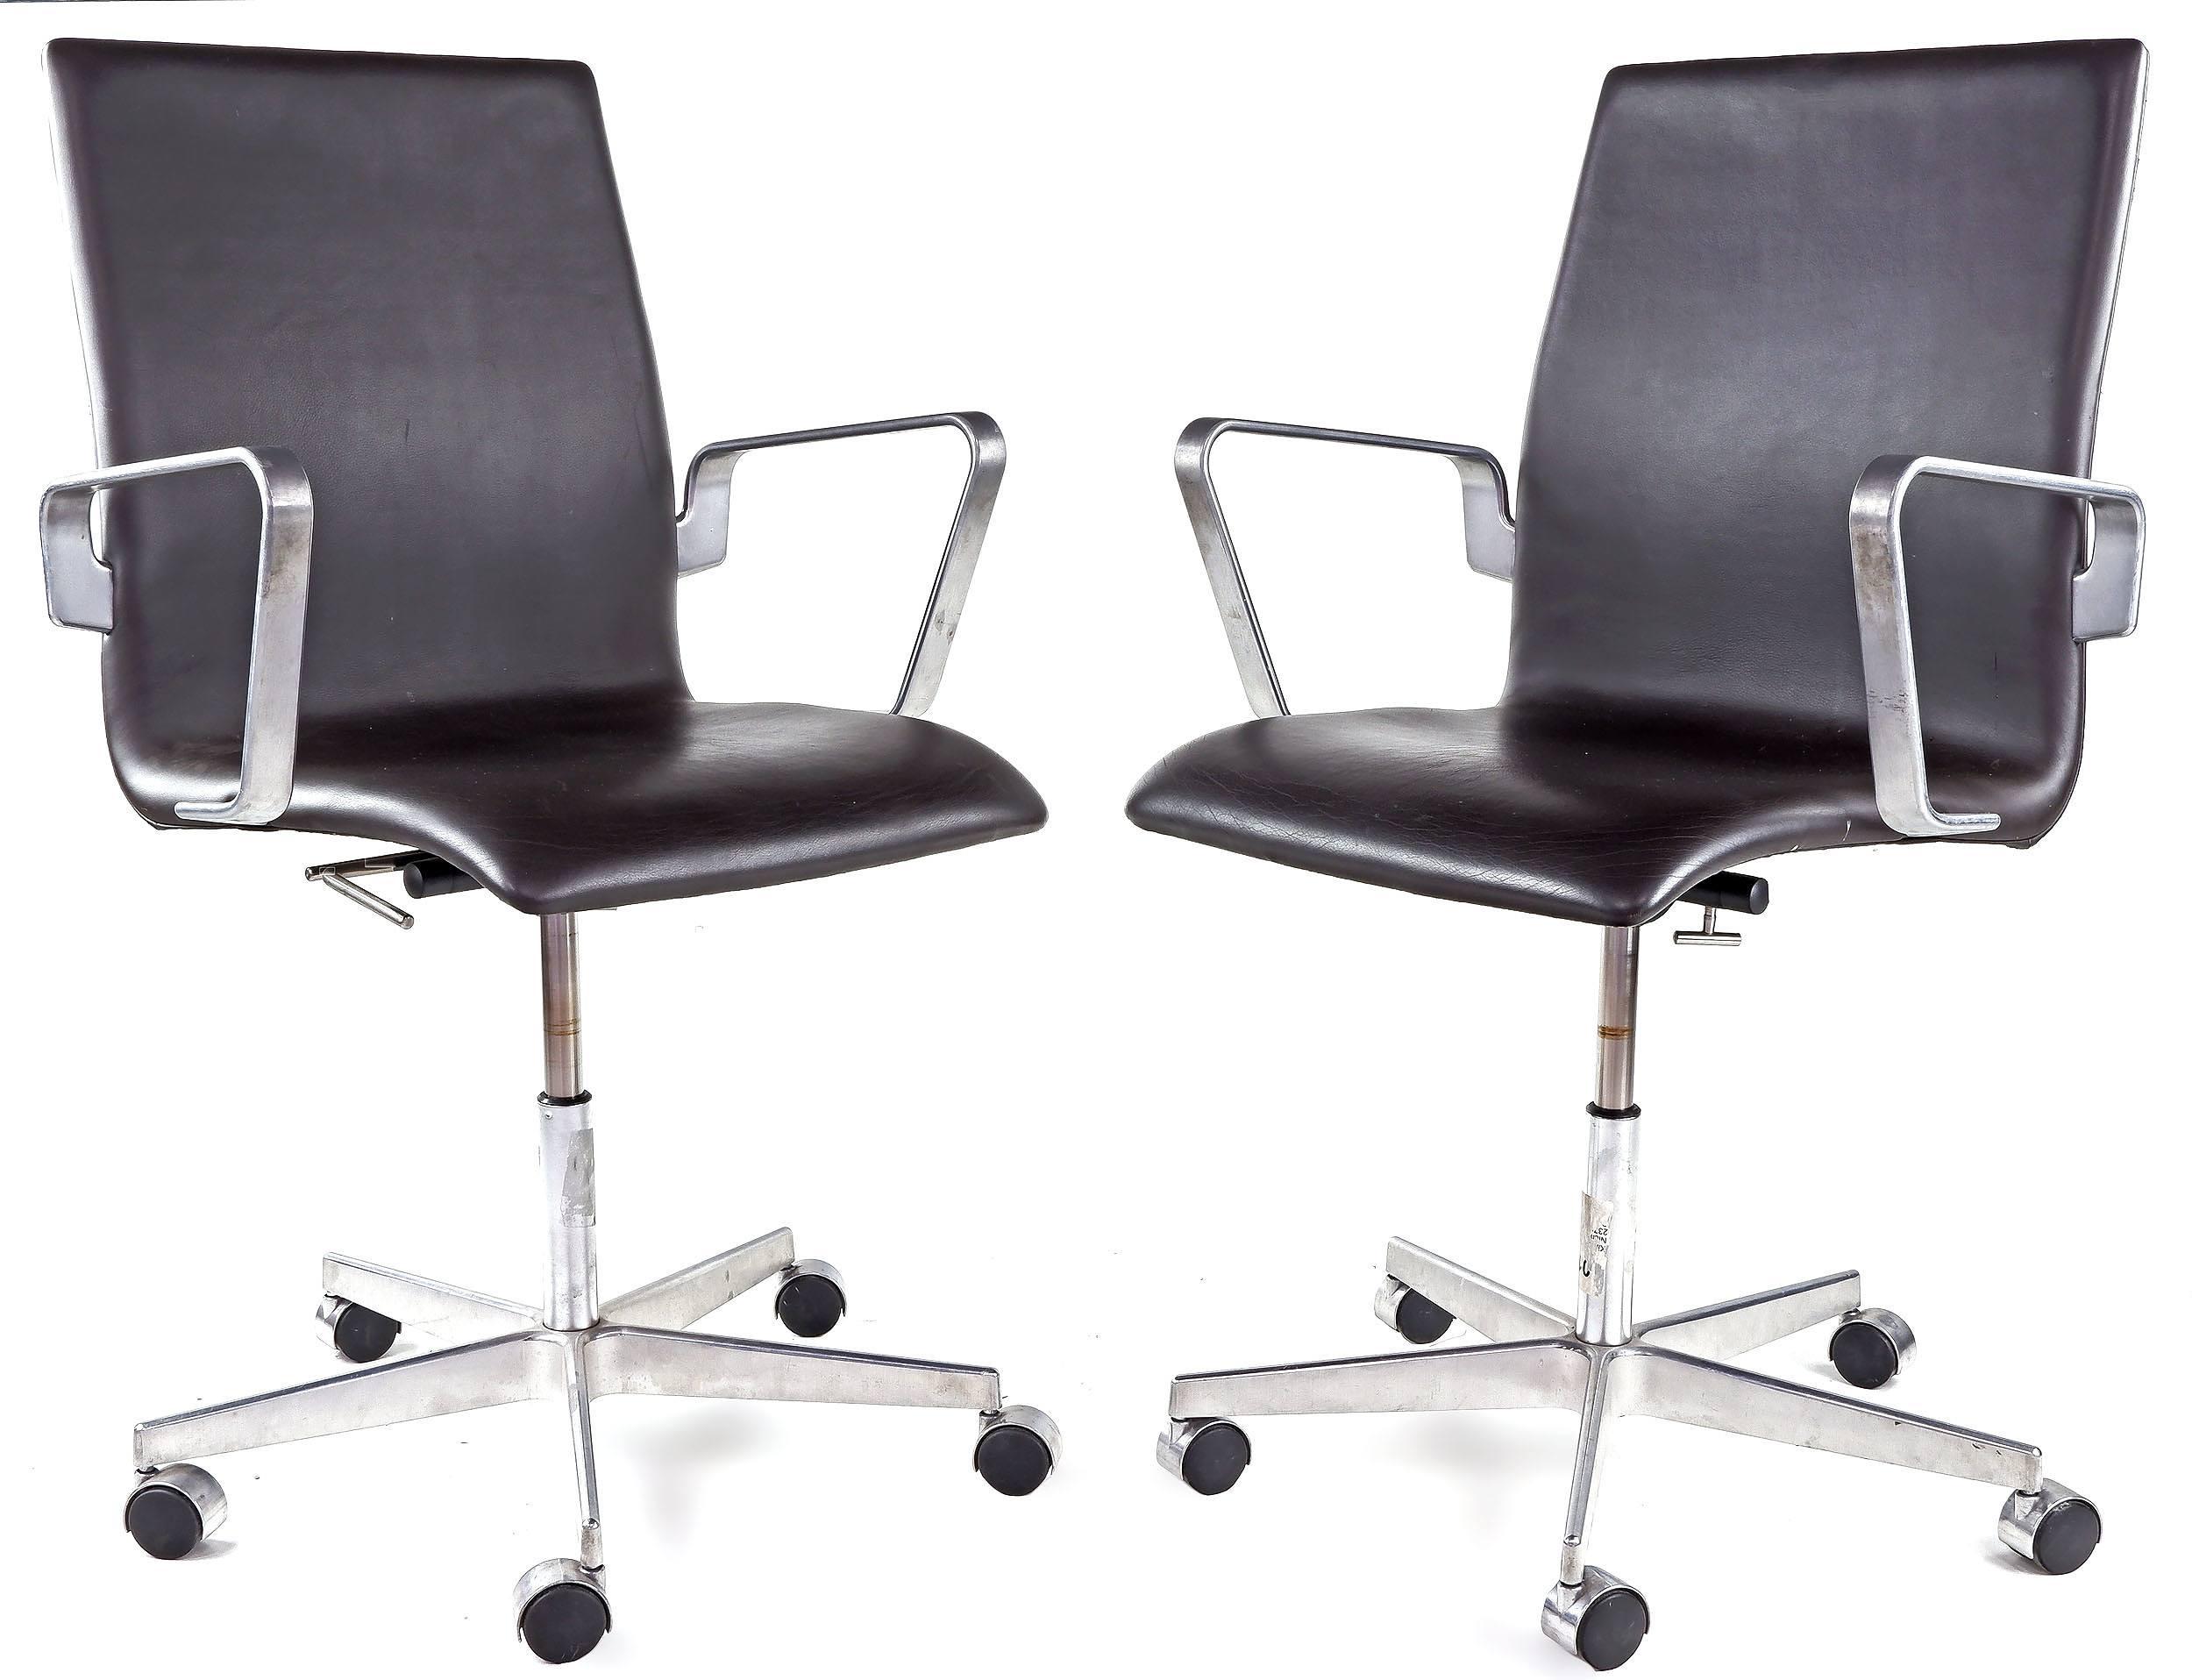 'Pair of Genuine Fritz Hansen Denmark Leather Upholstered Oxford Office Chairs Designed by Arne Jacobsen'